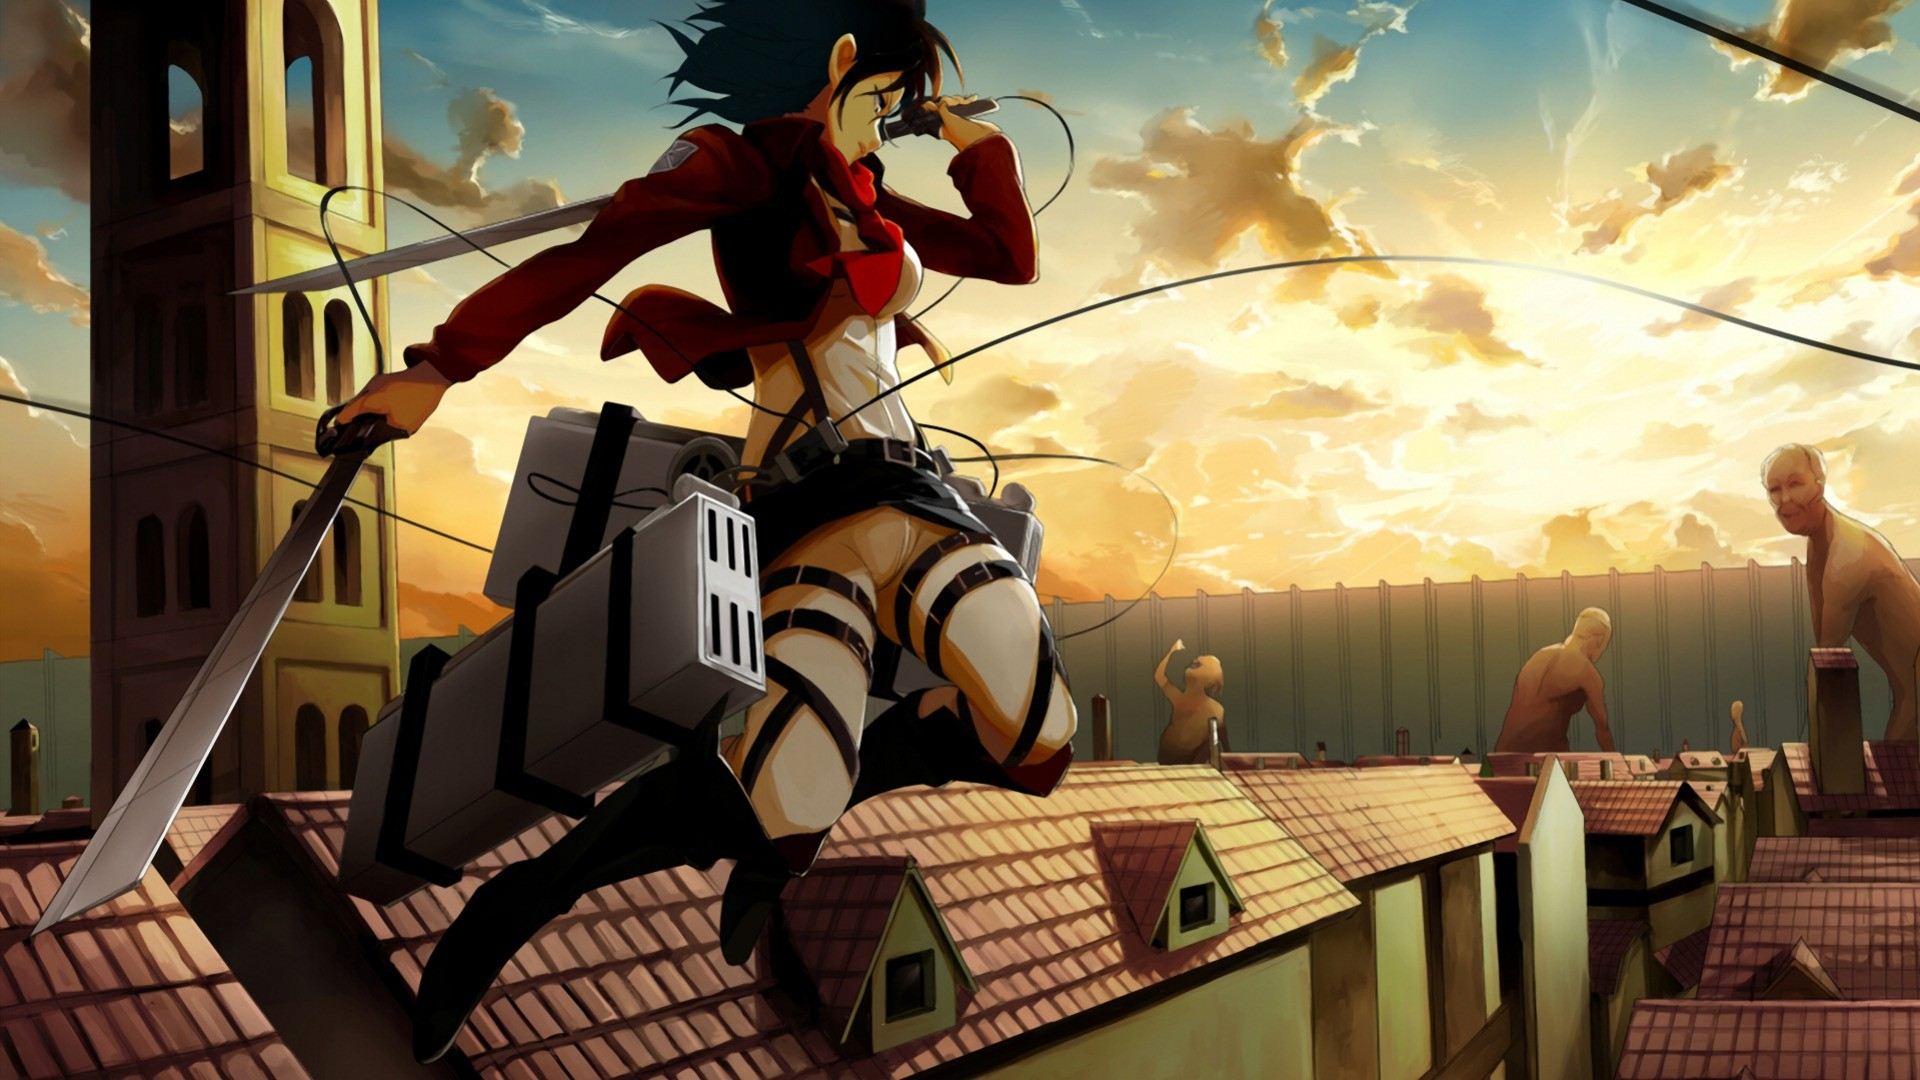 Mikasa Ackerman Wallpaper 1920x1080 Wallpaper Teahub Io